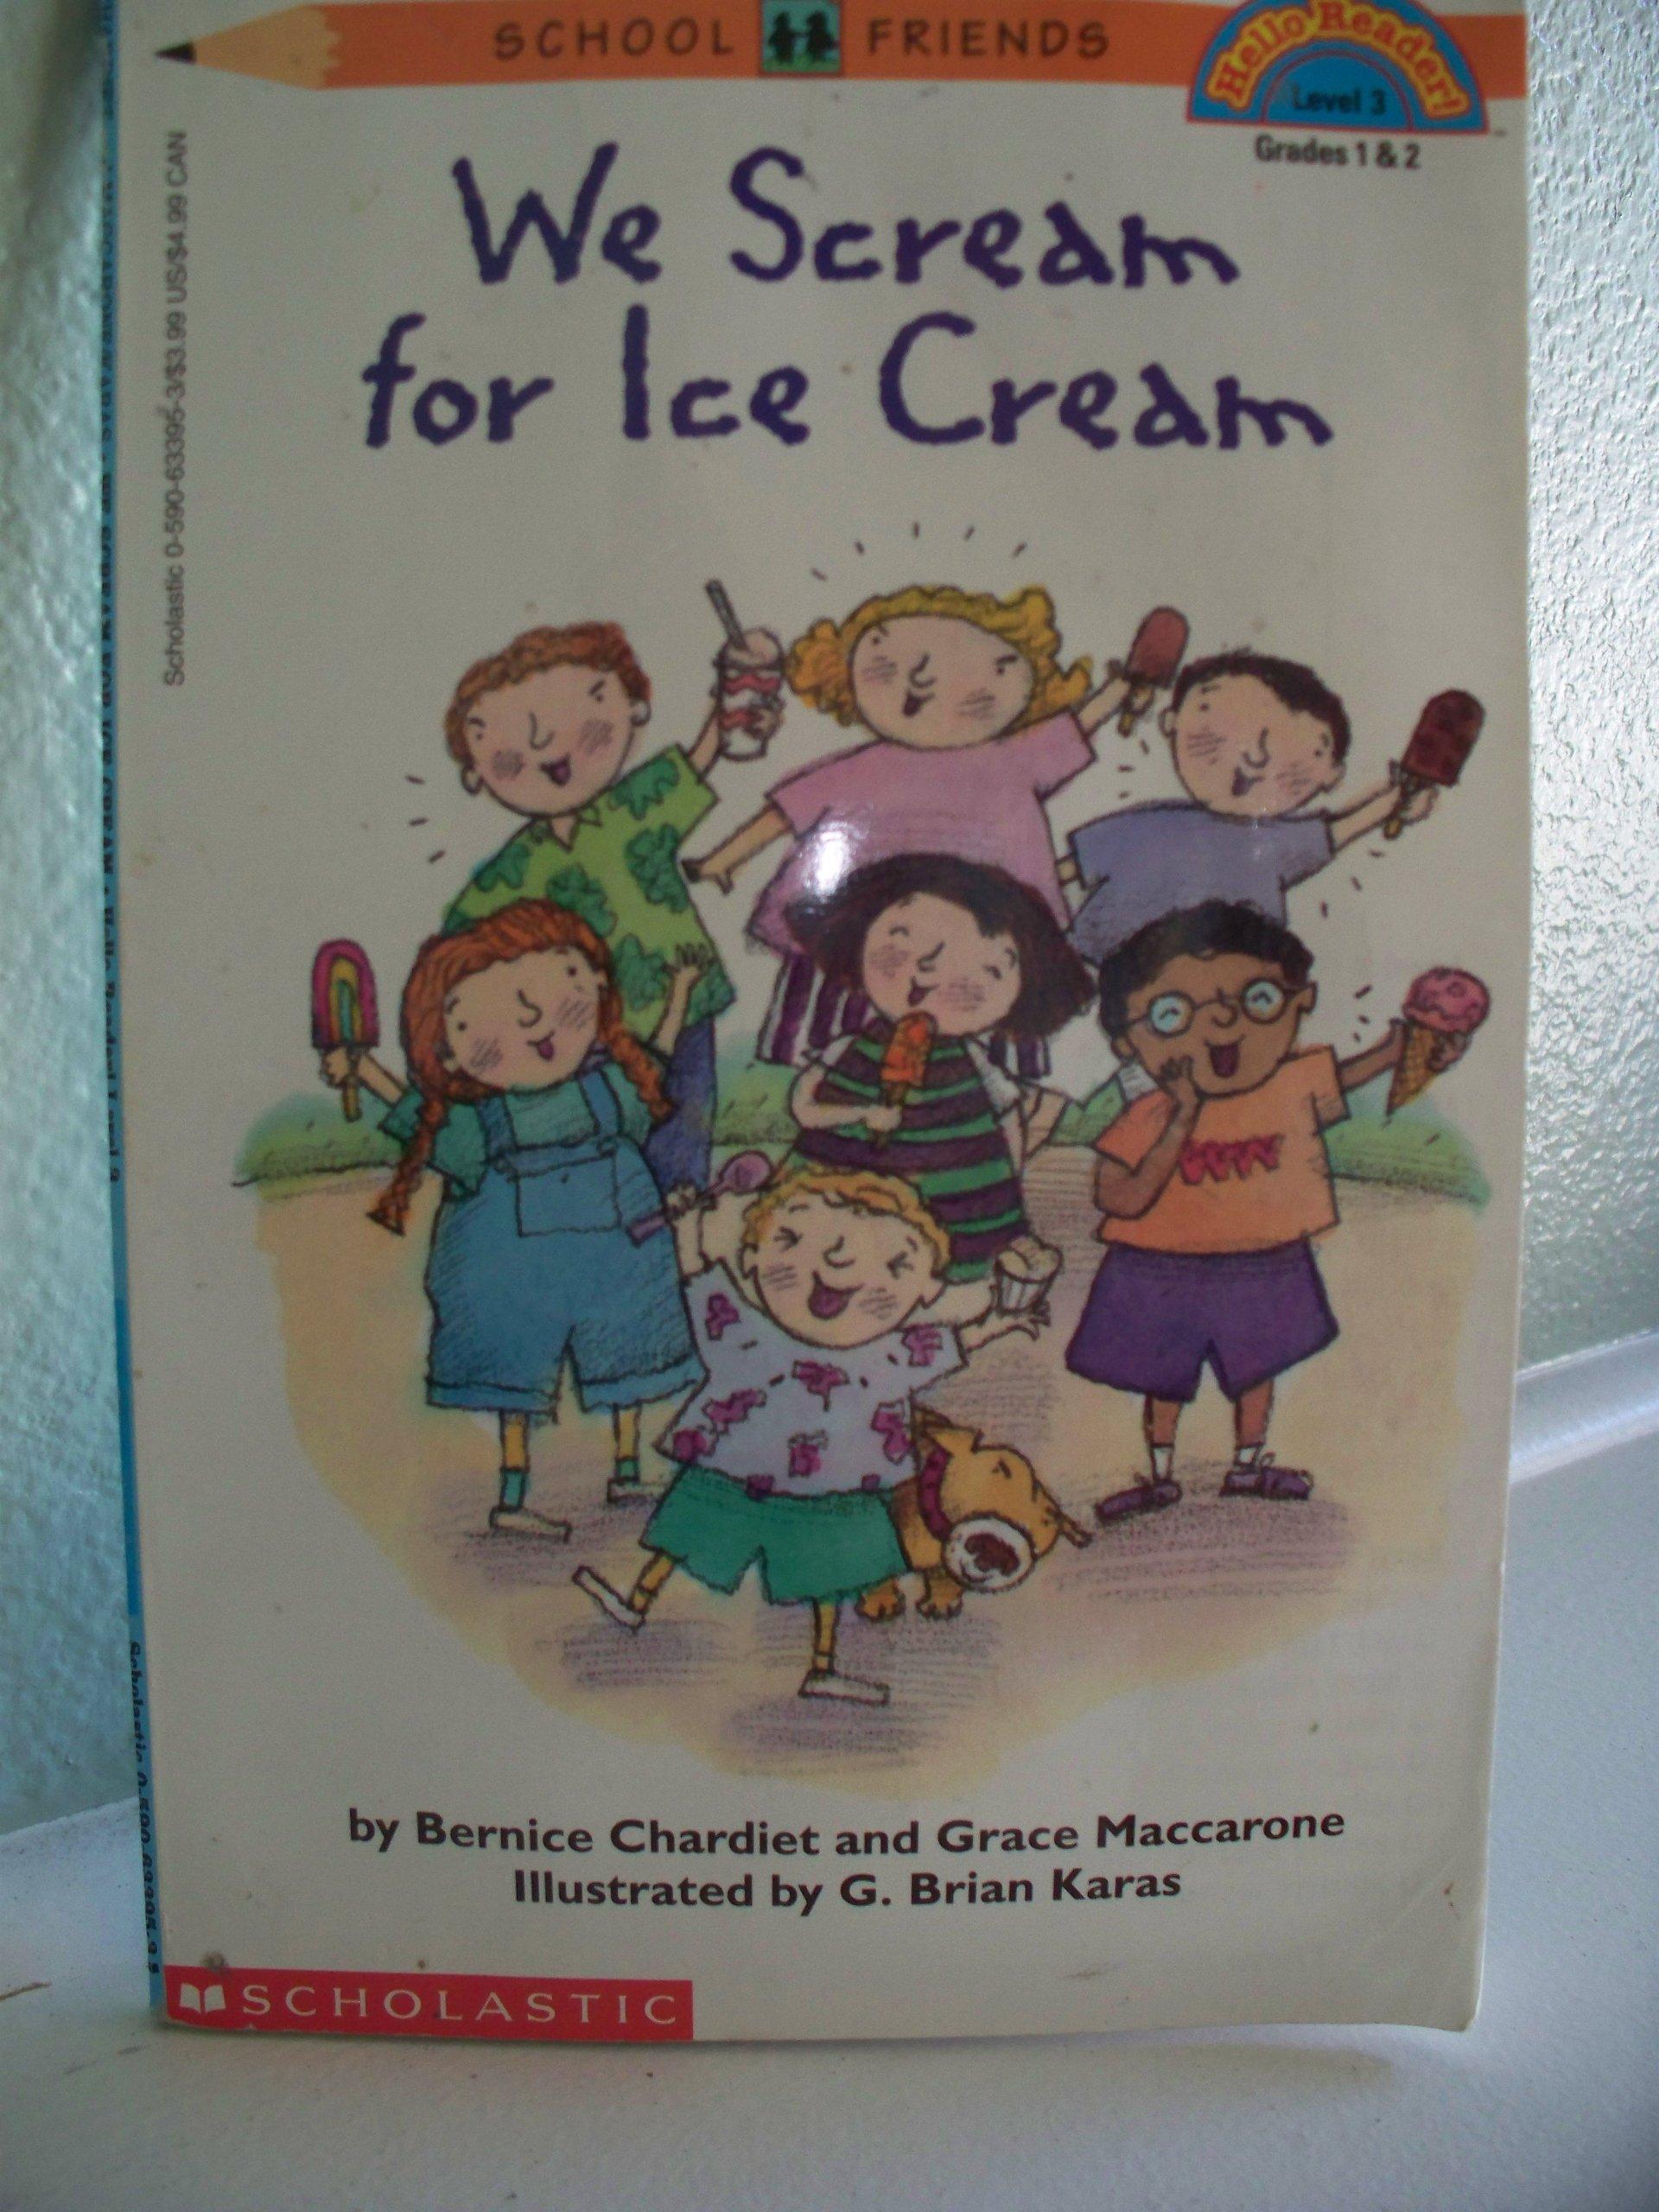 We Scream For Ice Cream School Friends Chardiet Bernice Maccarone Grace Karas G Brian 9780590633956 Amazon Com Books